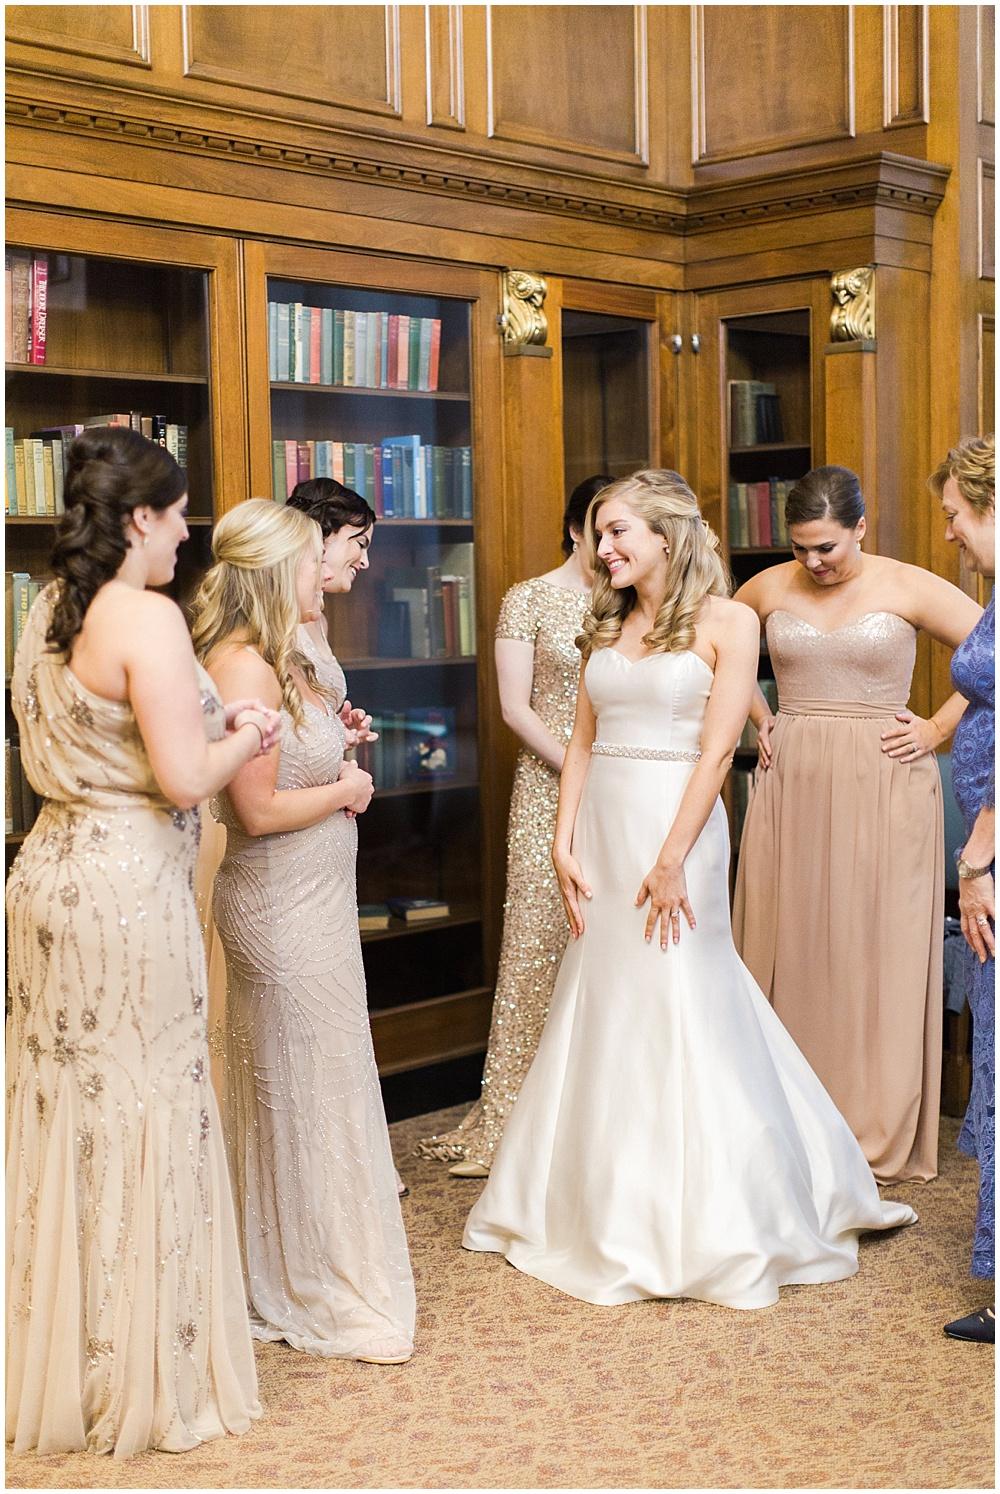 gold bridesmaid dresses | Ivan & Louise Images and Jessica Dum Wedding Coordination